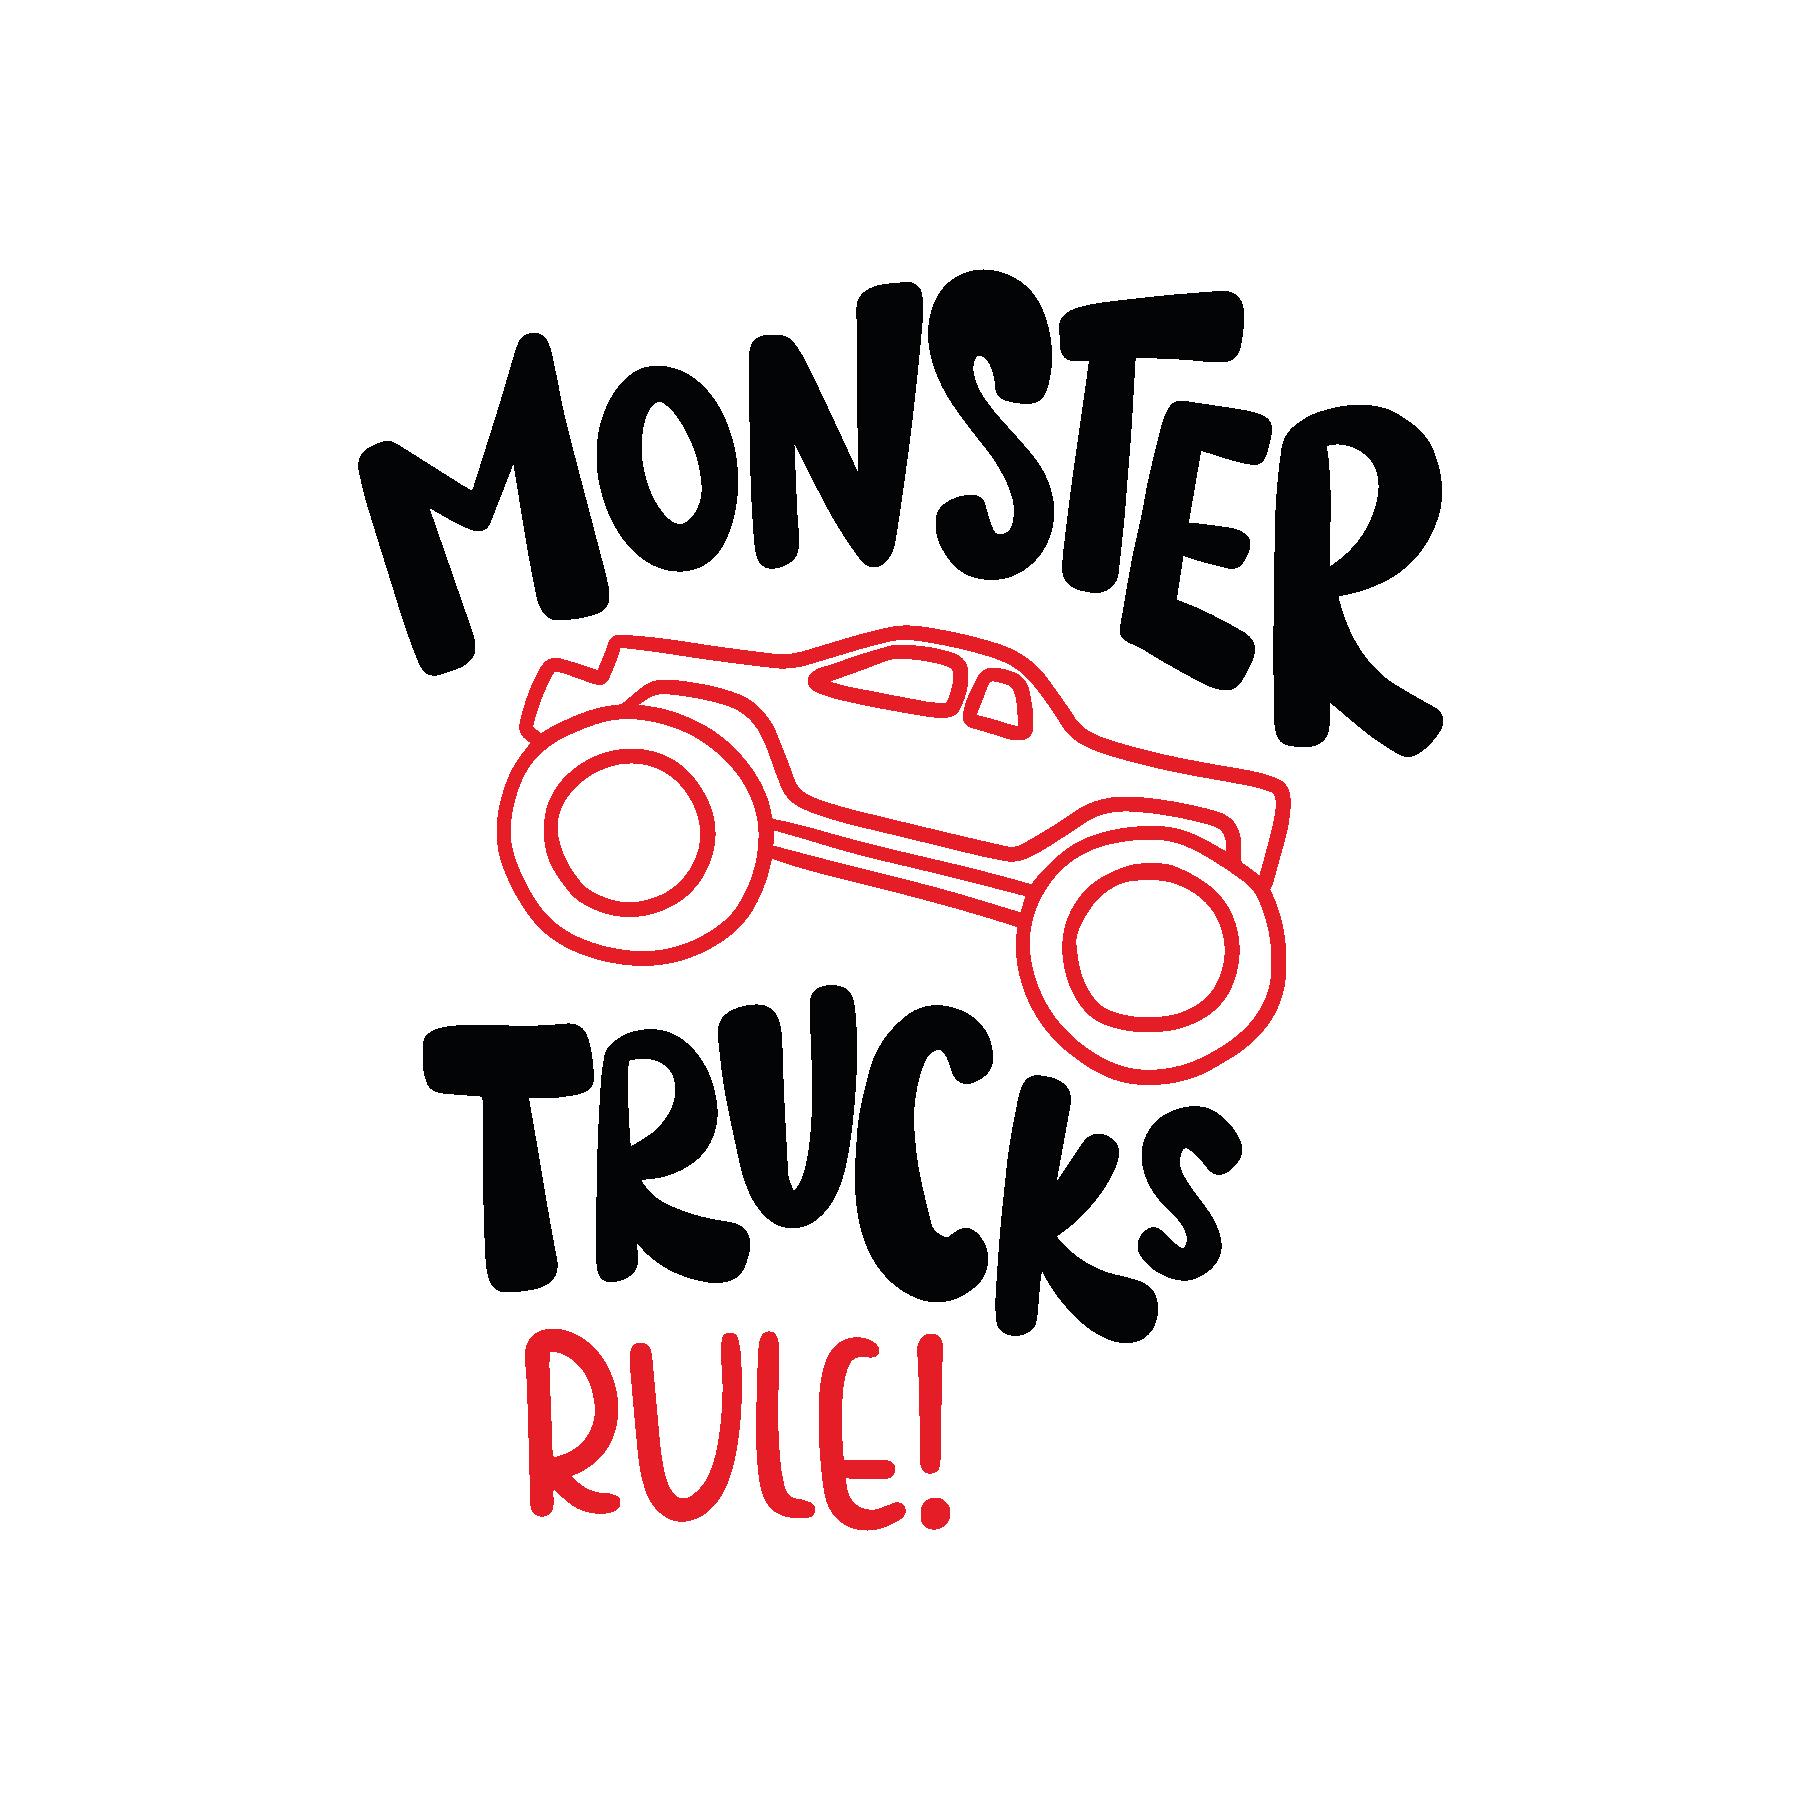 Download Pin by Kateland Adkins on LOVE SVG | Monster trucks, Svg ...